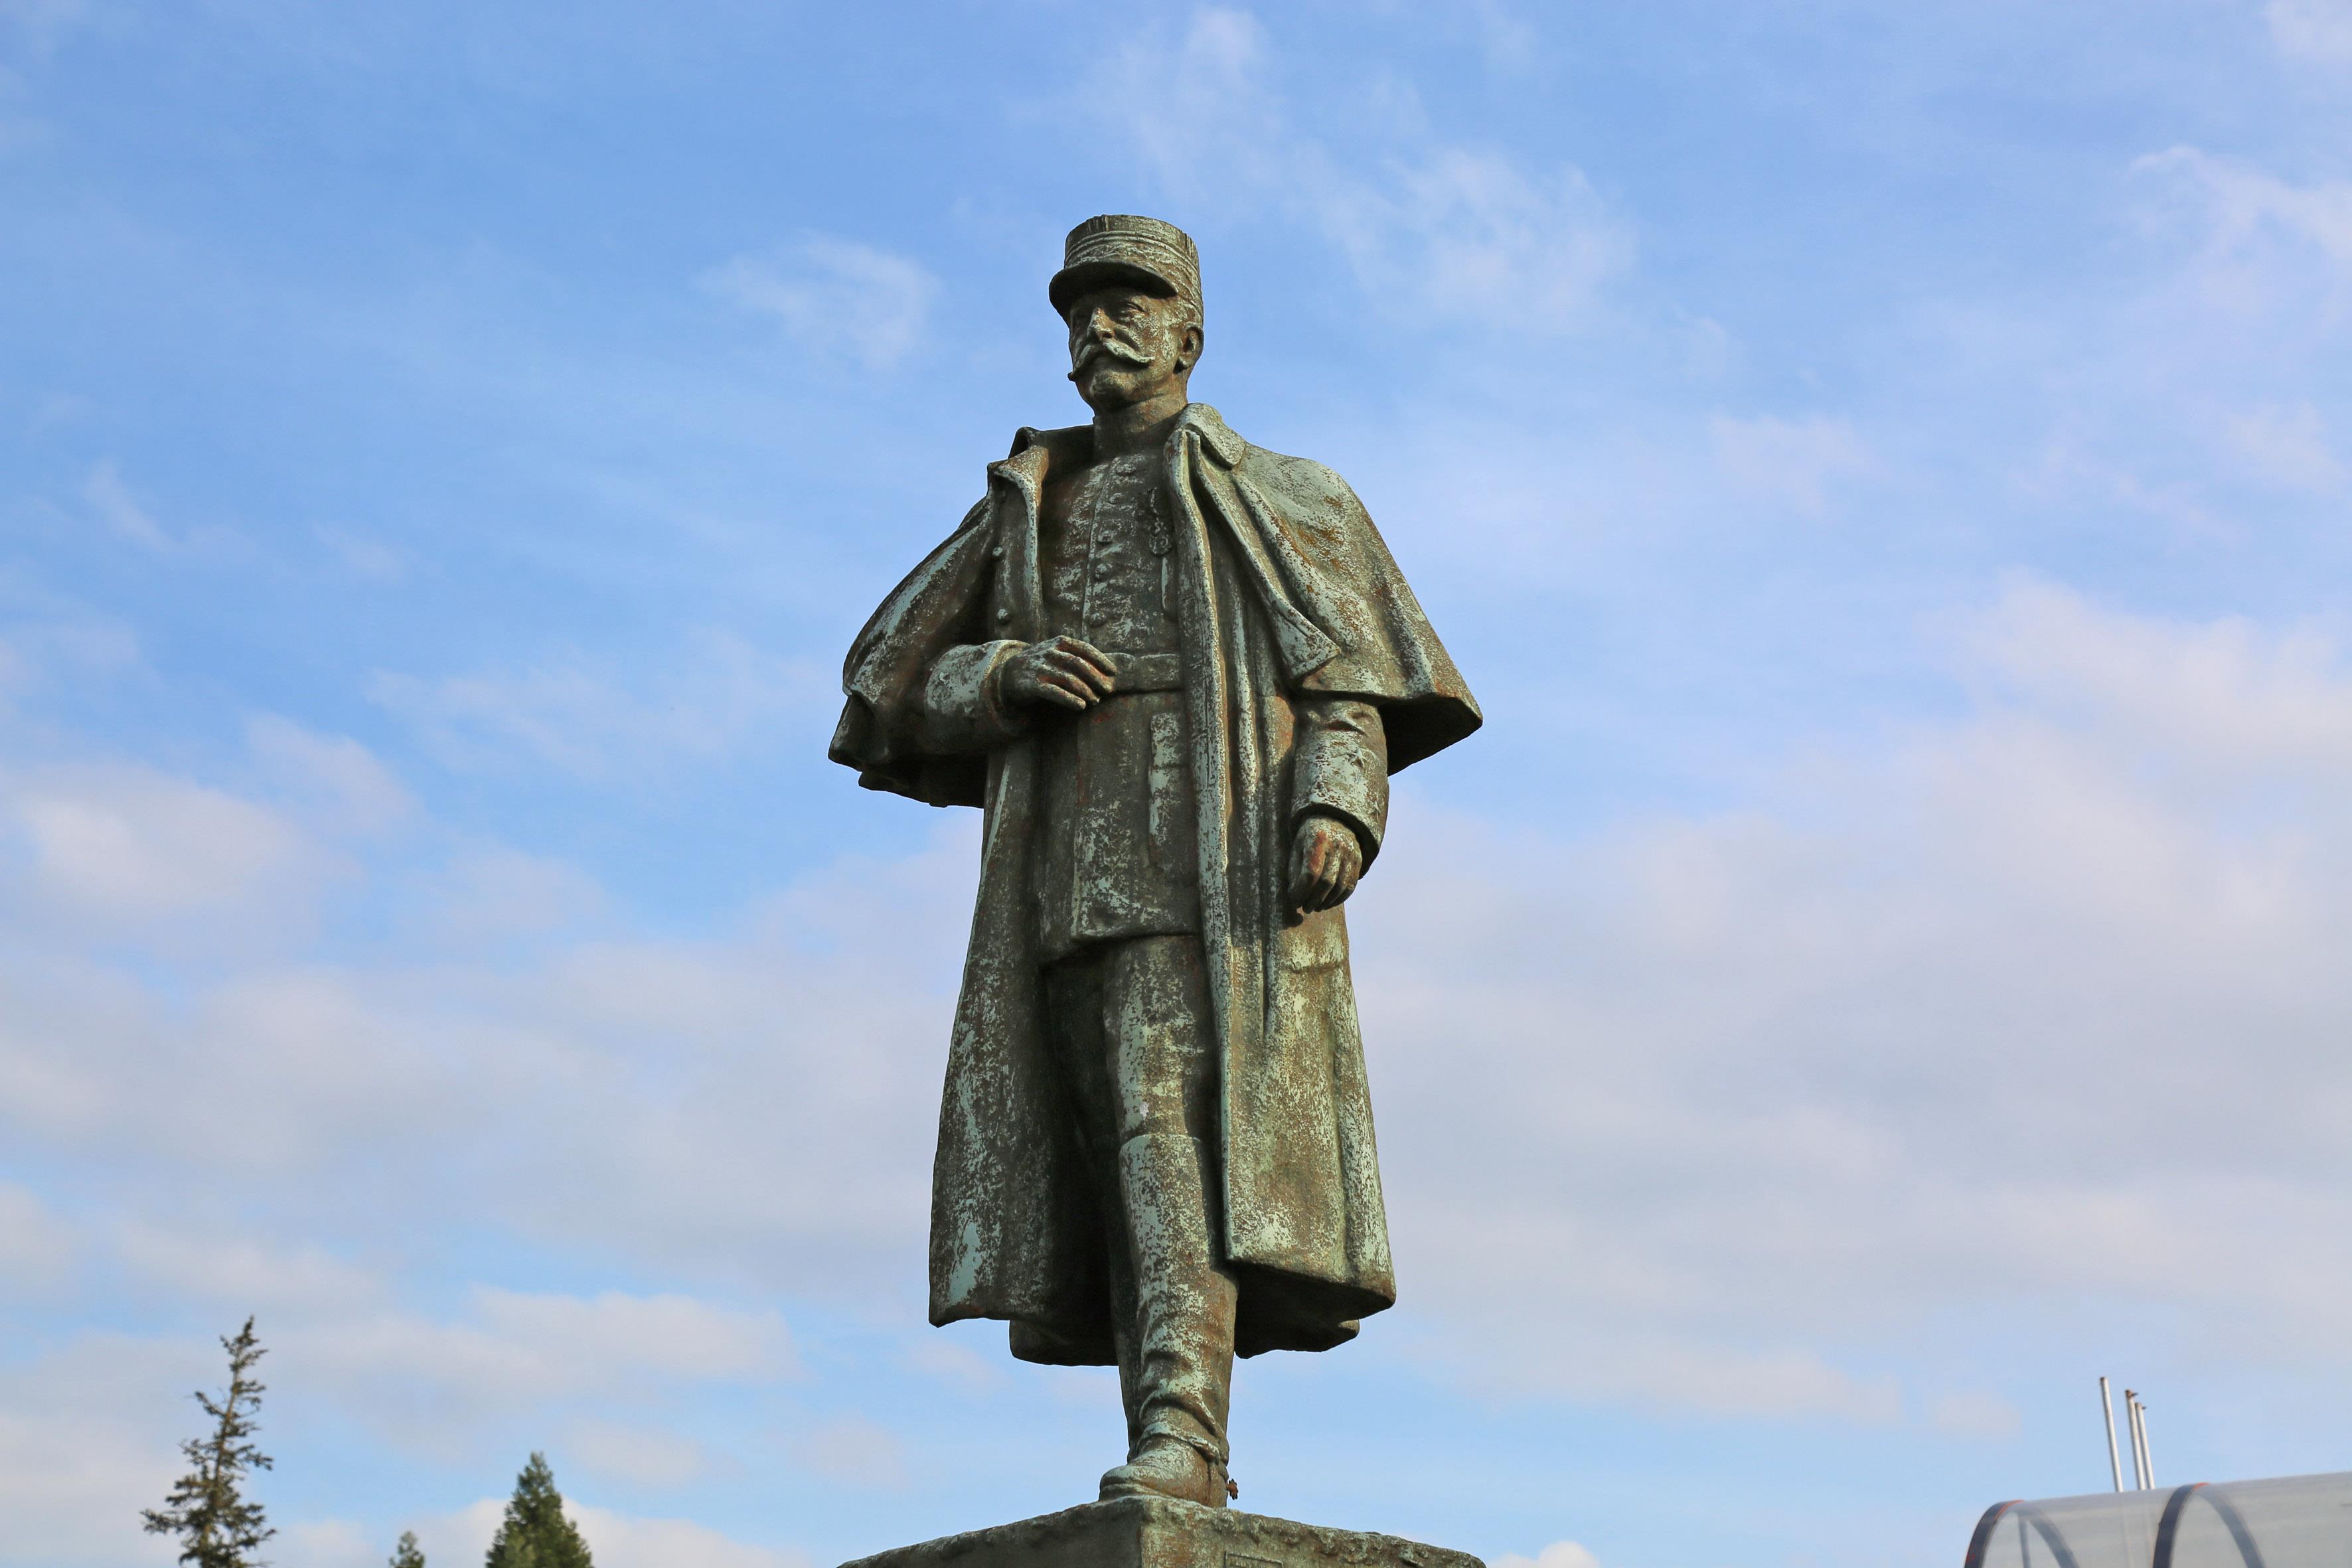 MONUMENT AU GÉNÉRAL SARRAIL